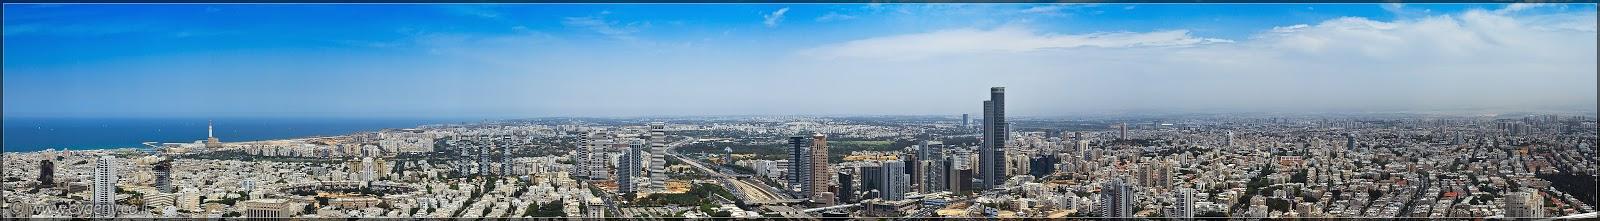 Фото: Панорама: Тель Авив, Рамат Ган, Бней Брак, Гиватаим с крыши Азриэли